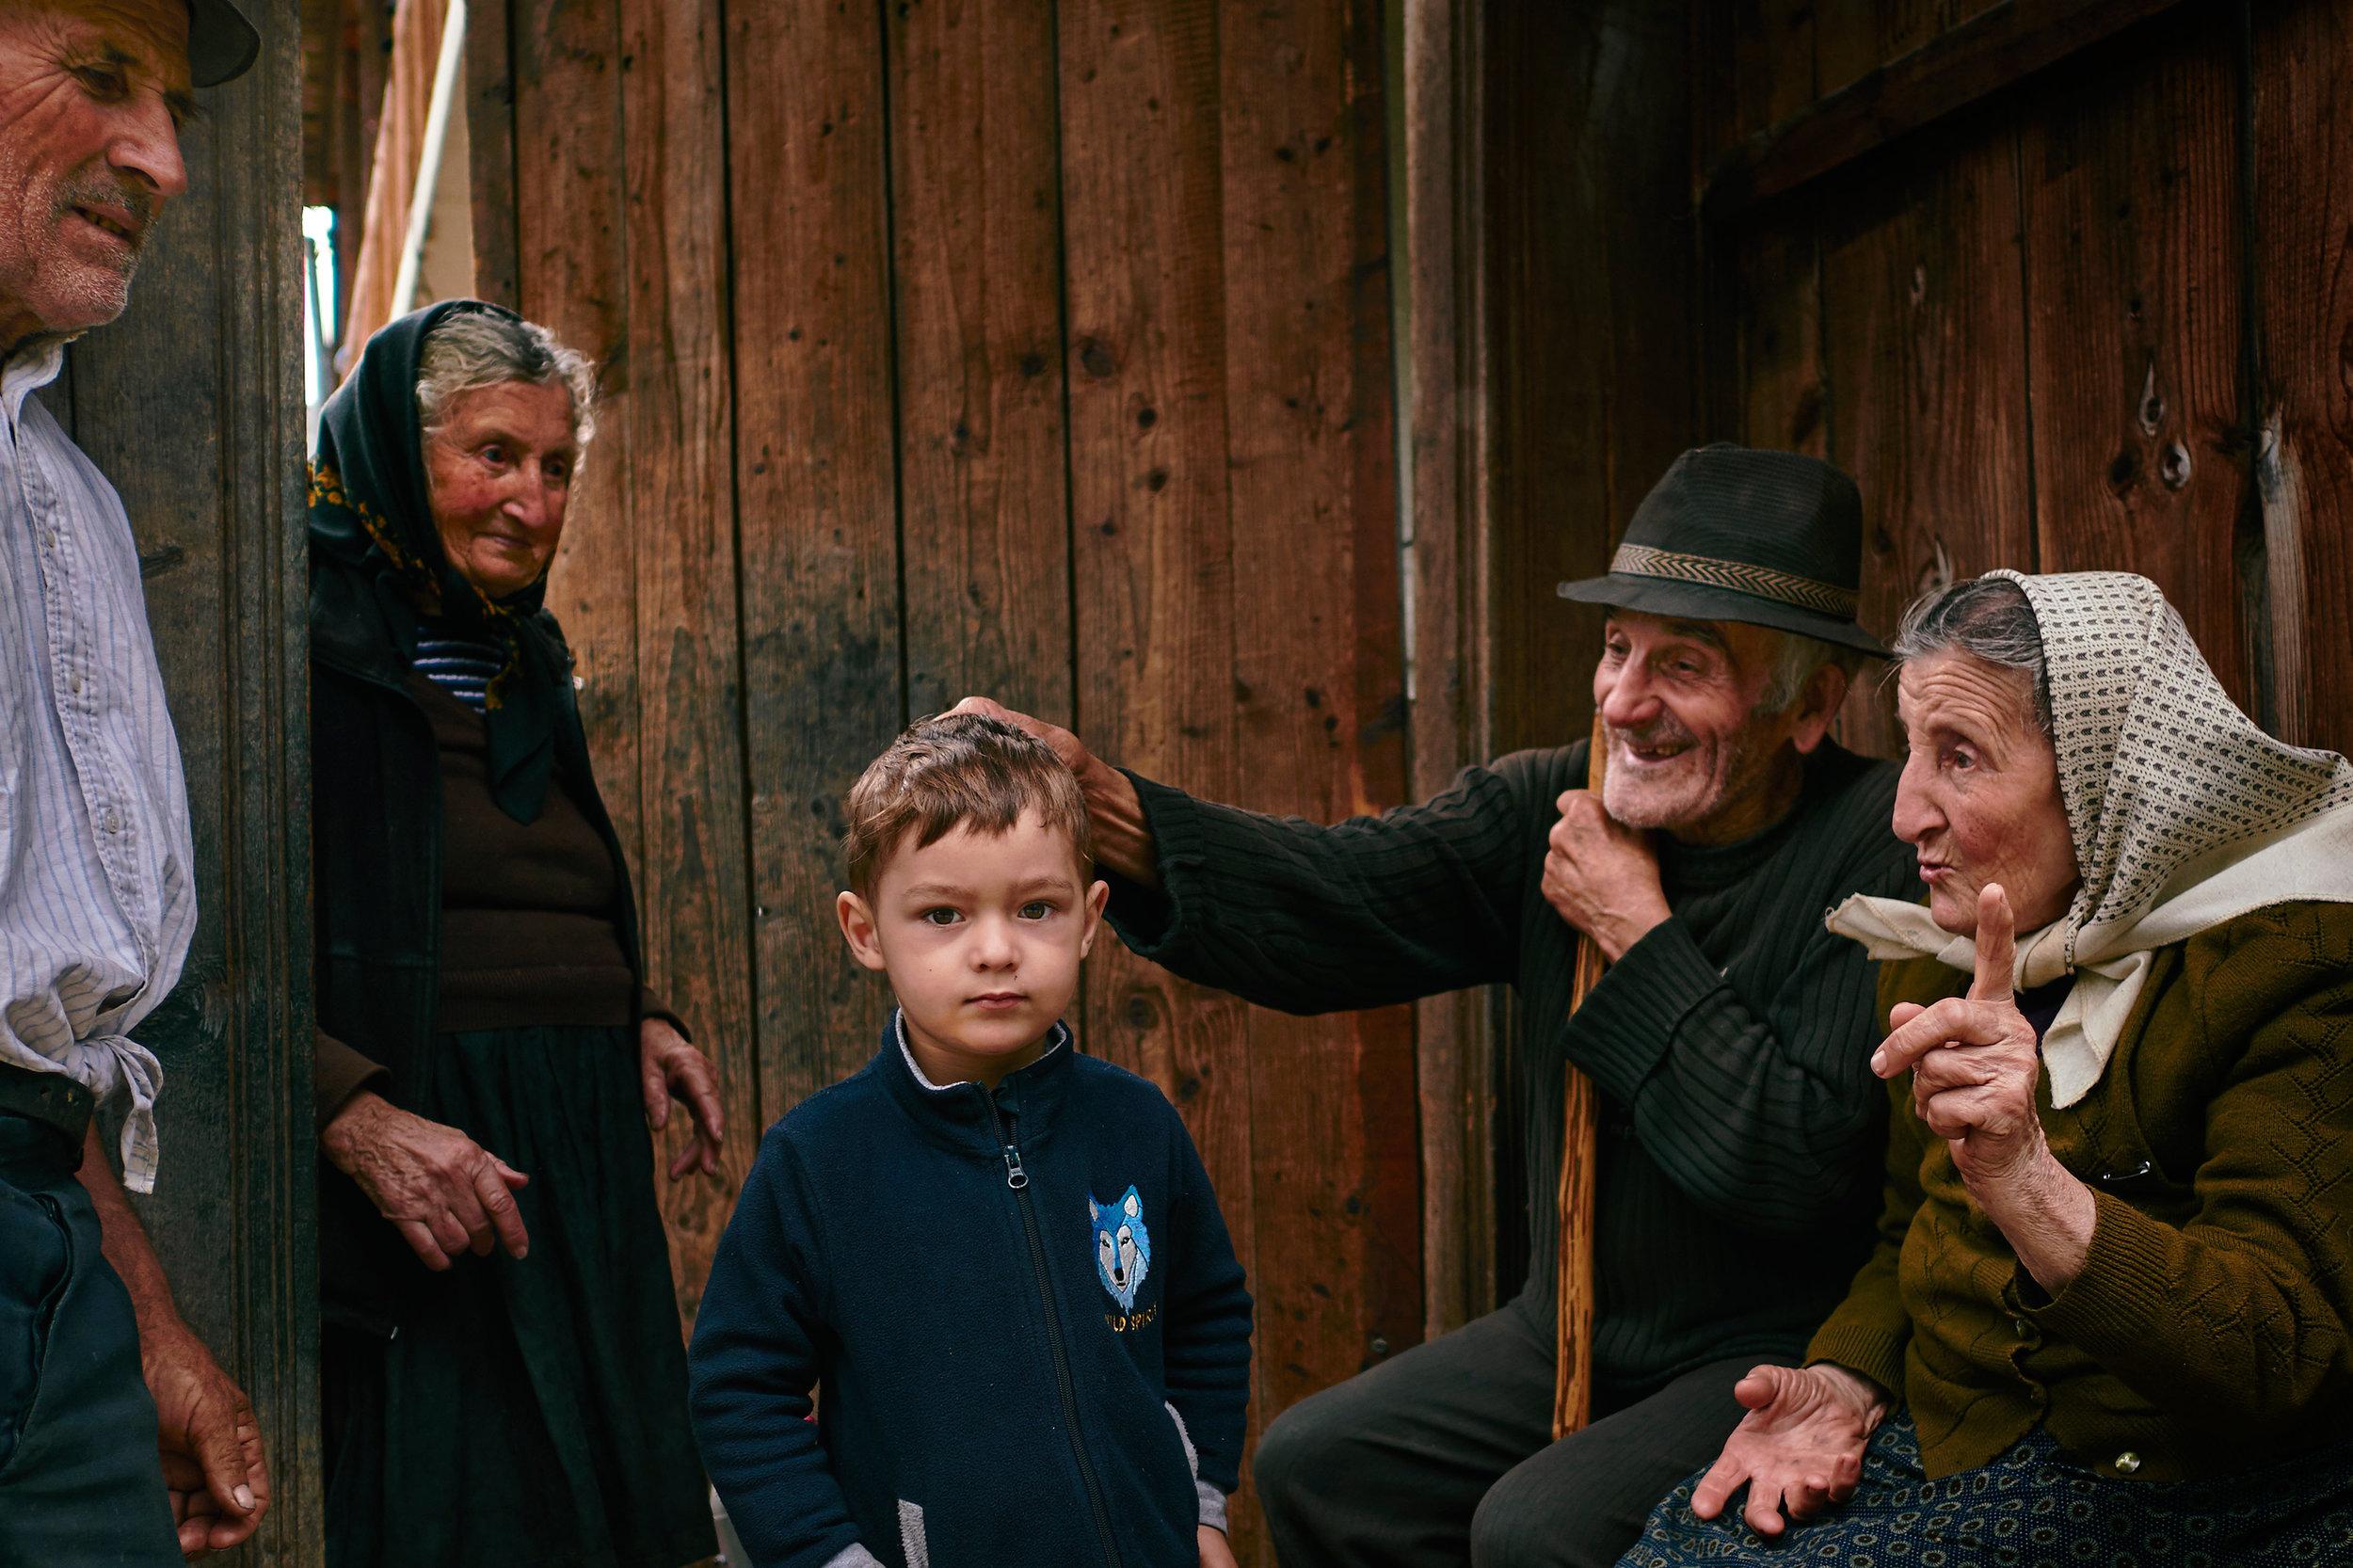 Maramures-Romania-village-street-life